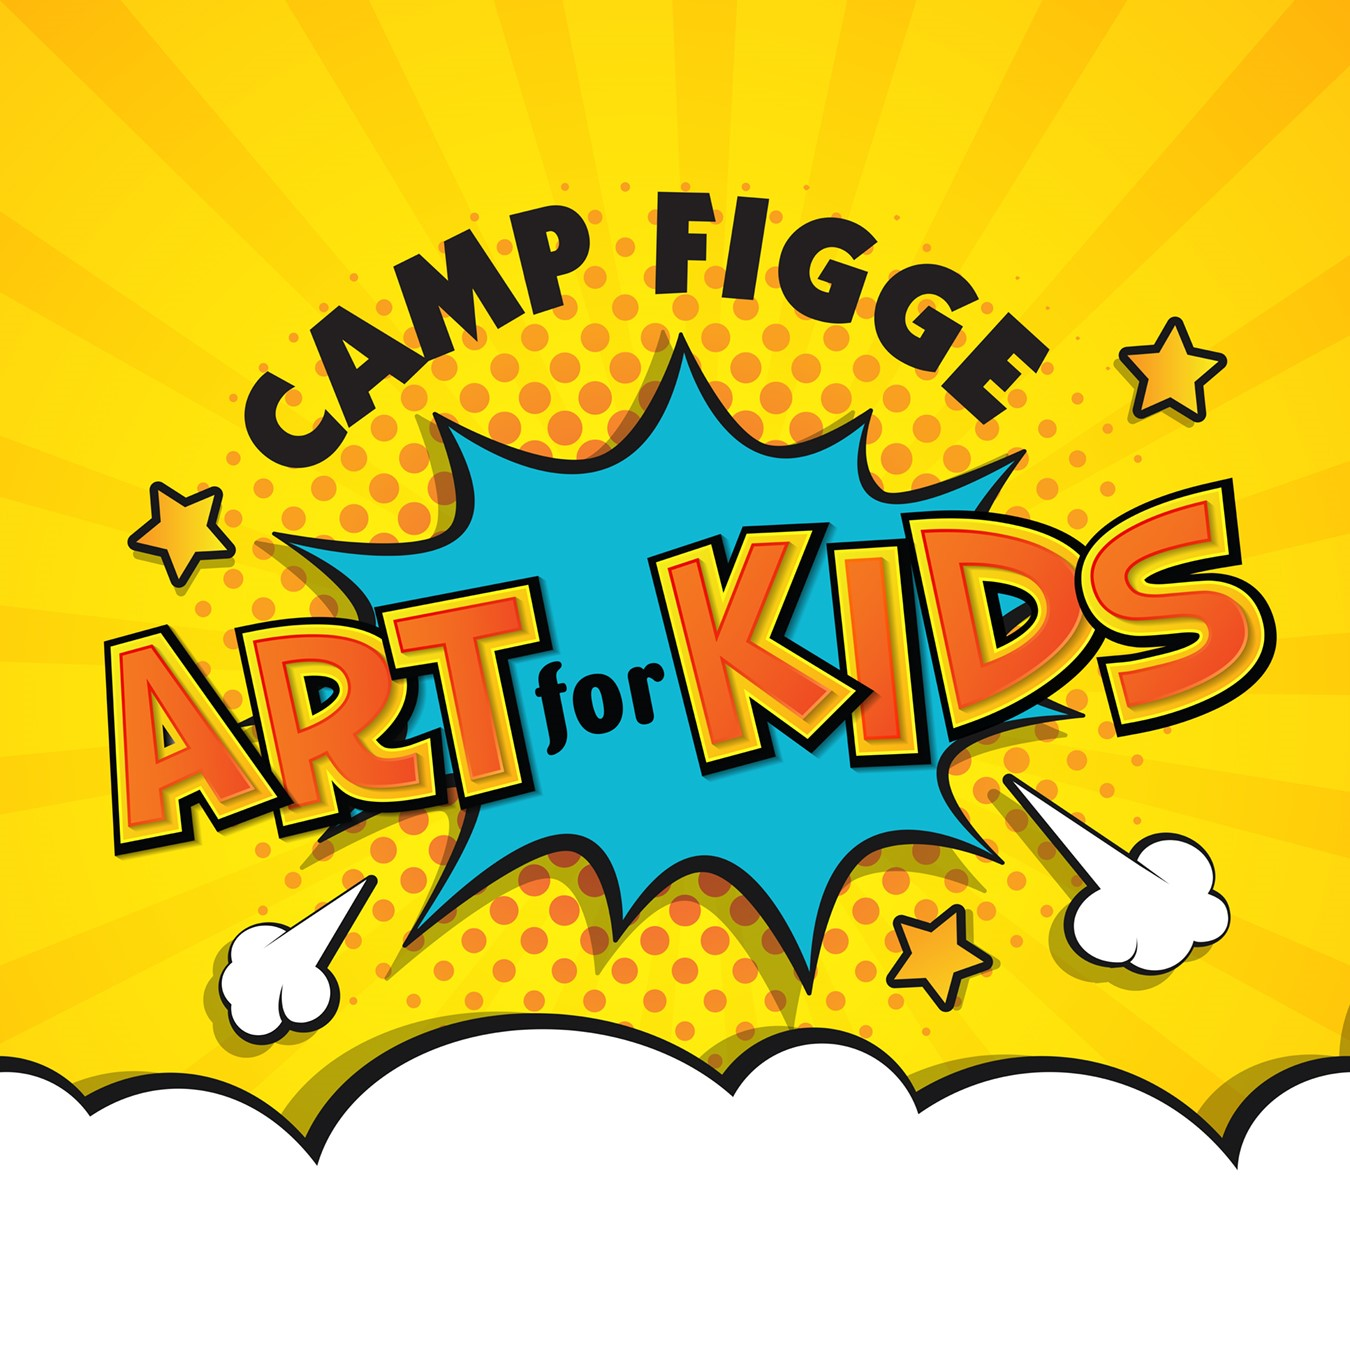 Camp figge image